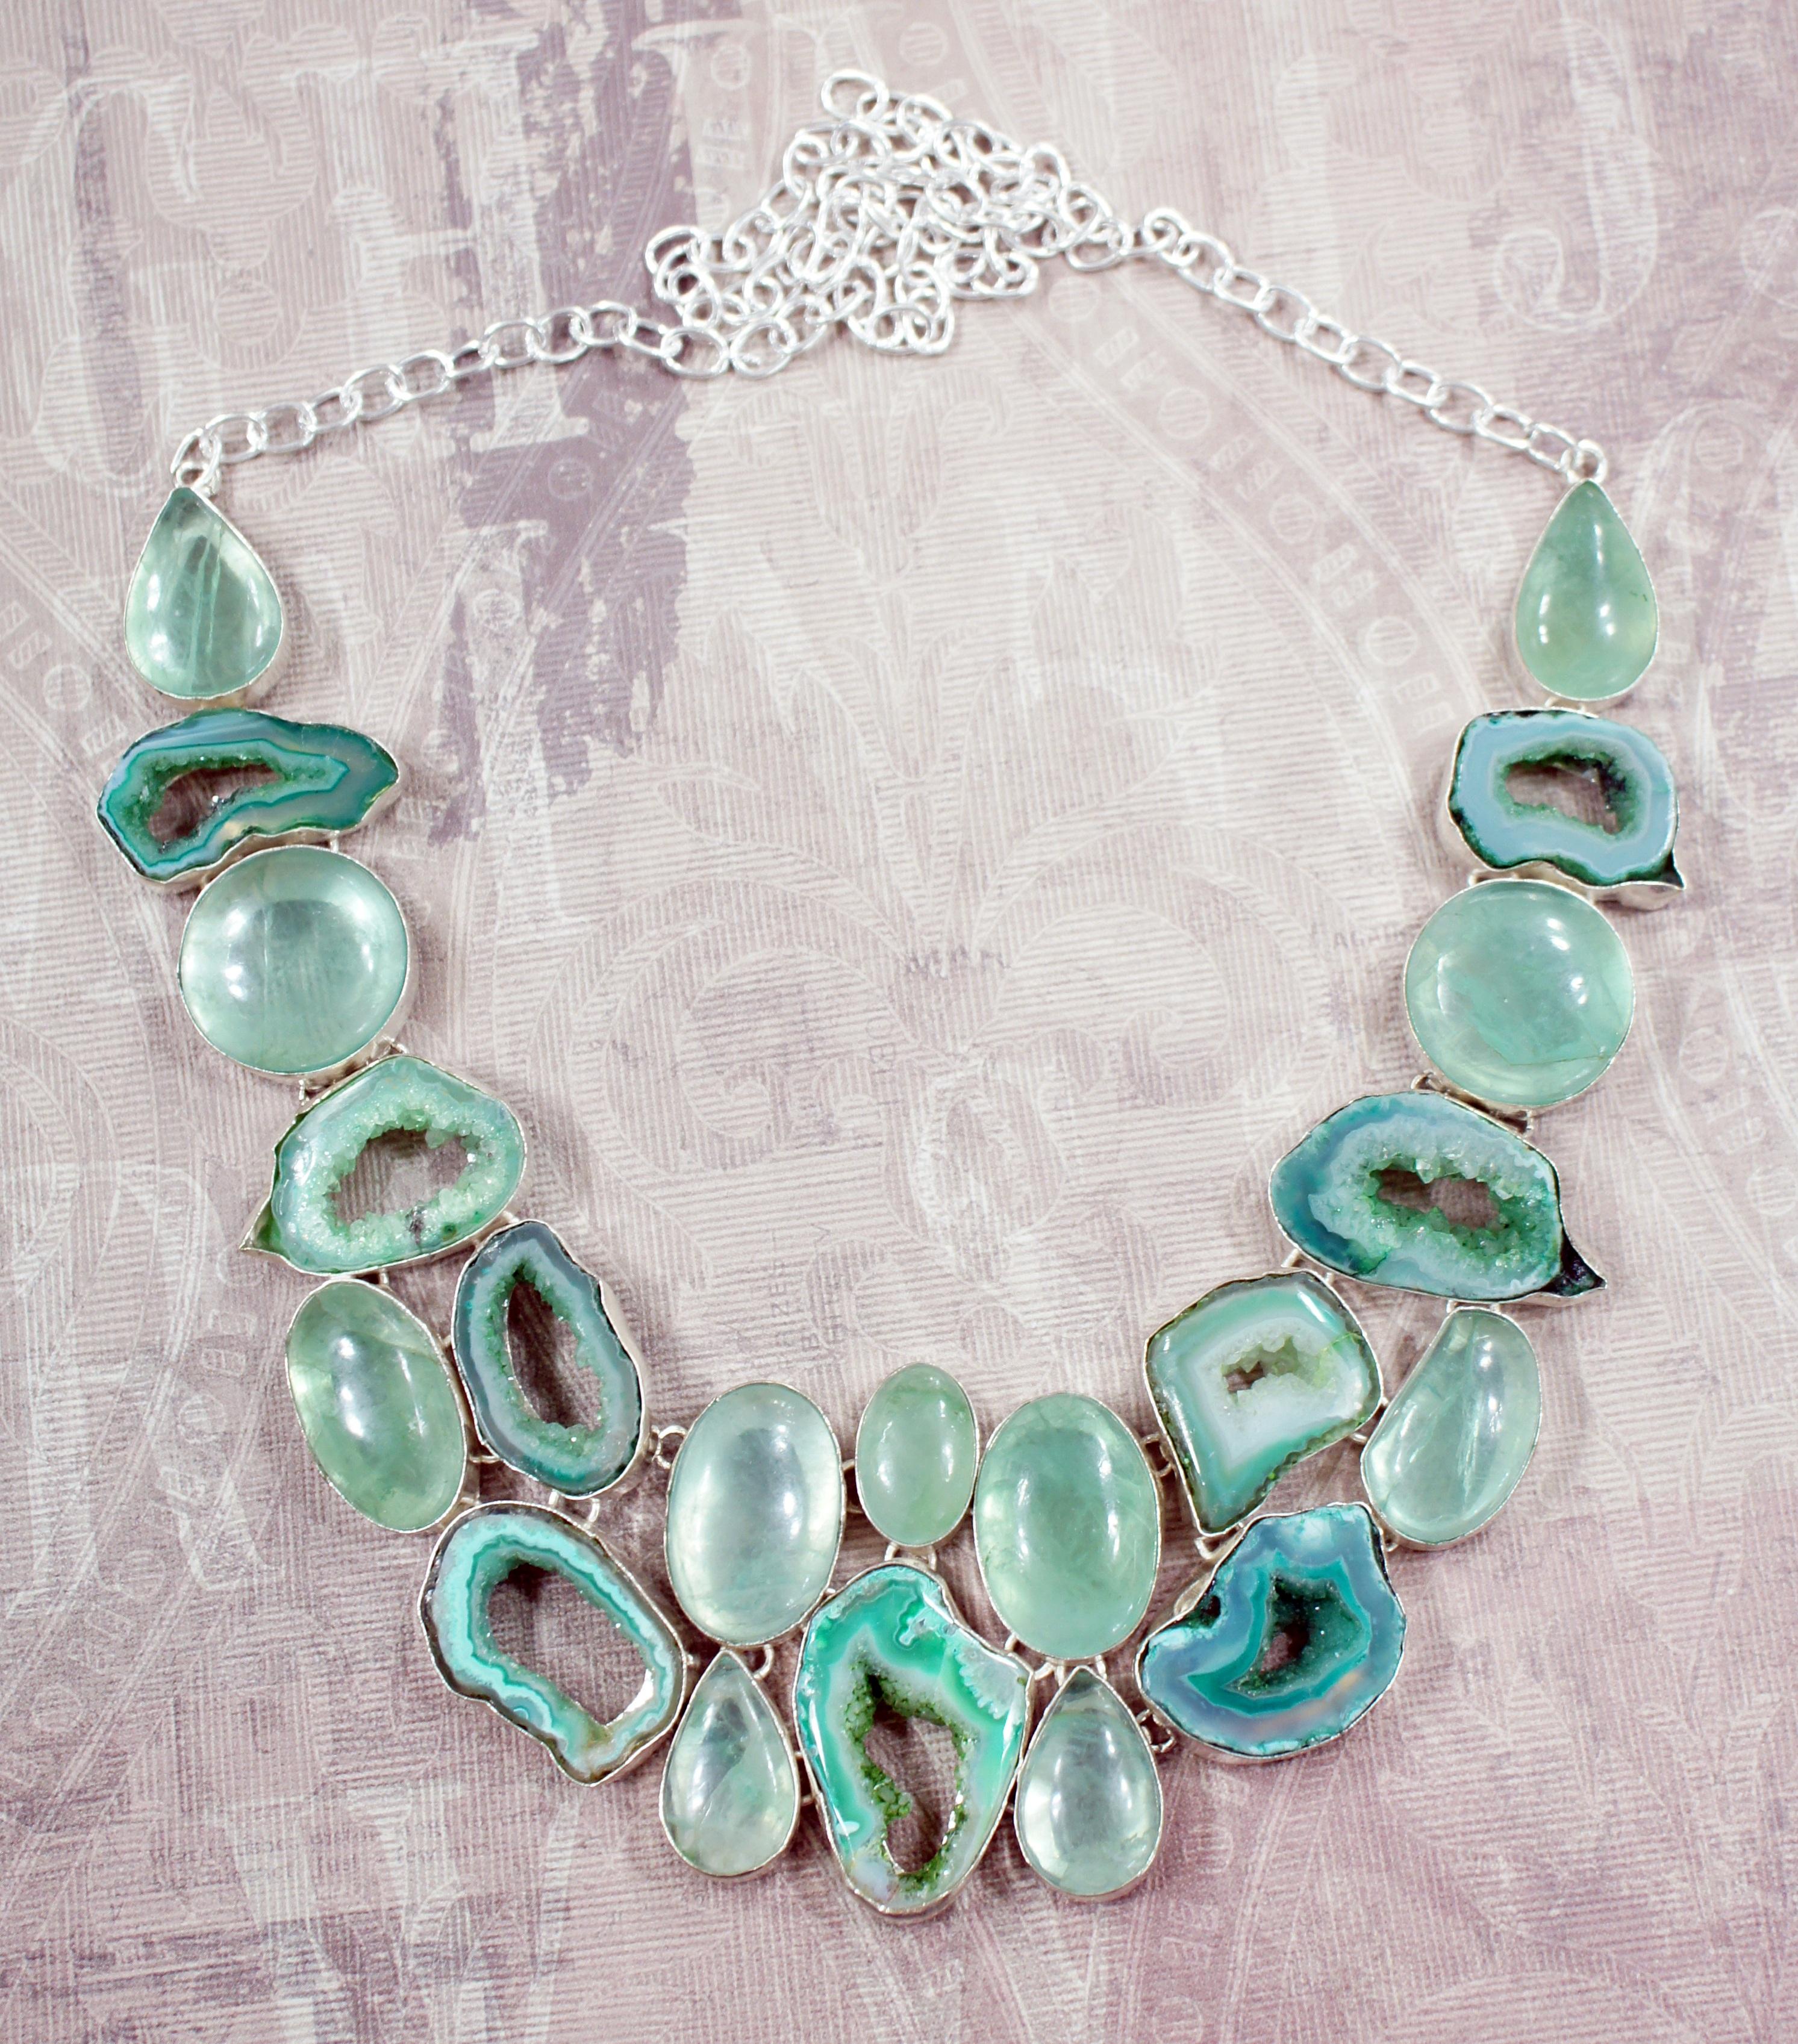 Gambar Rantai Hijau Alam Titisan Perhiasan Kalung Aqua 1 Set Perak Pirus Buatan Tangan Besar Batu Permata Kristal Geode Murni Mineral Kuarsa